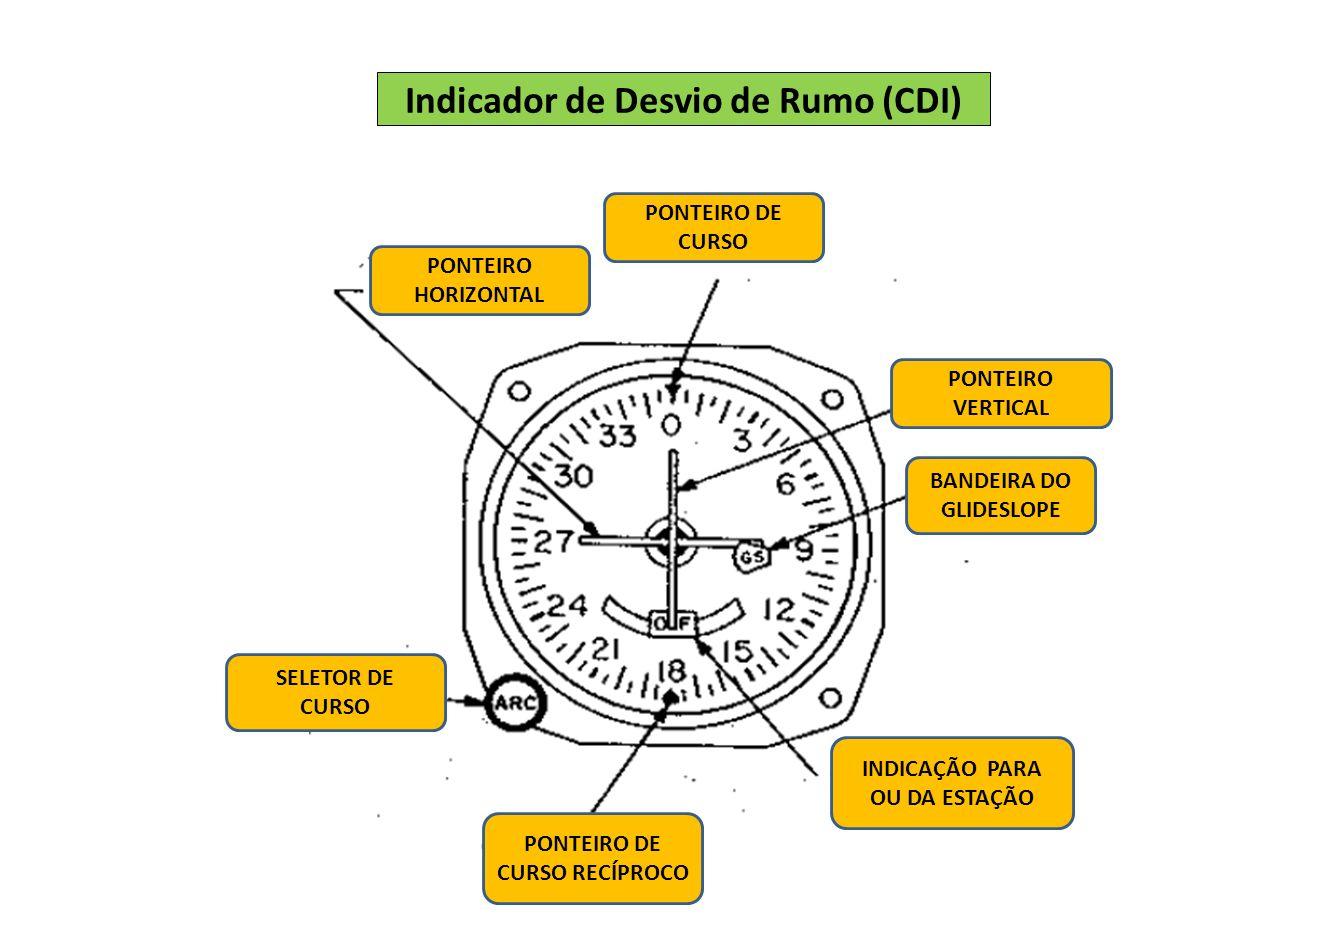 Indicador de Desvio de Rumo (CDI)